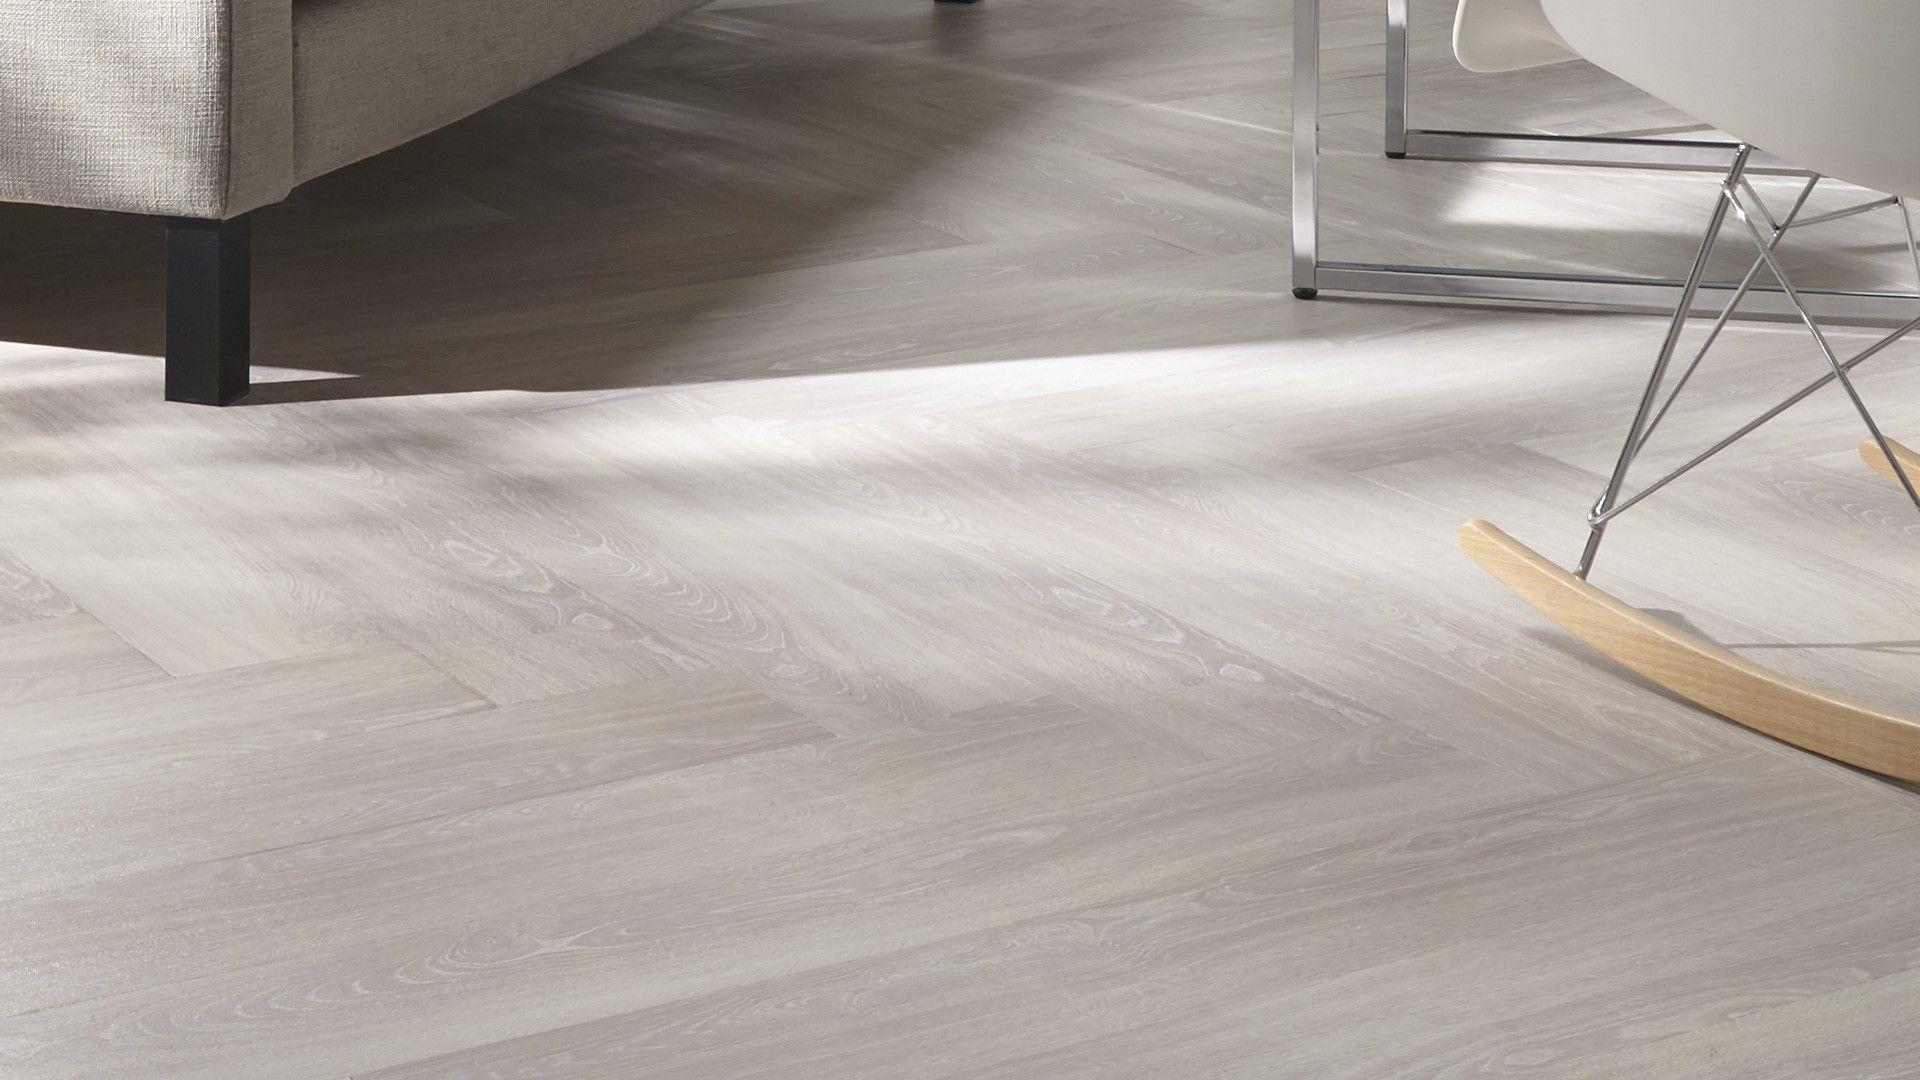 100 Incroyable Concepts Lino Imitation Parquet Blanc destiné Linoleum Naturel Castorama